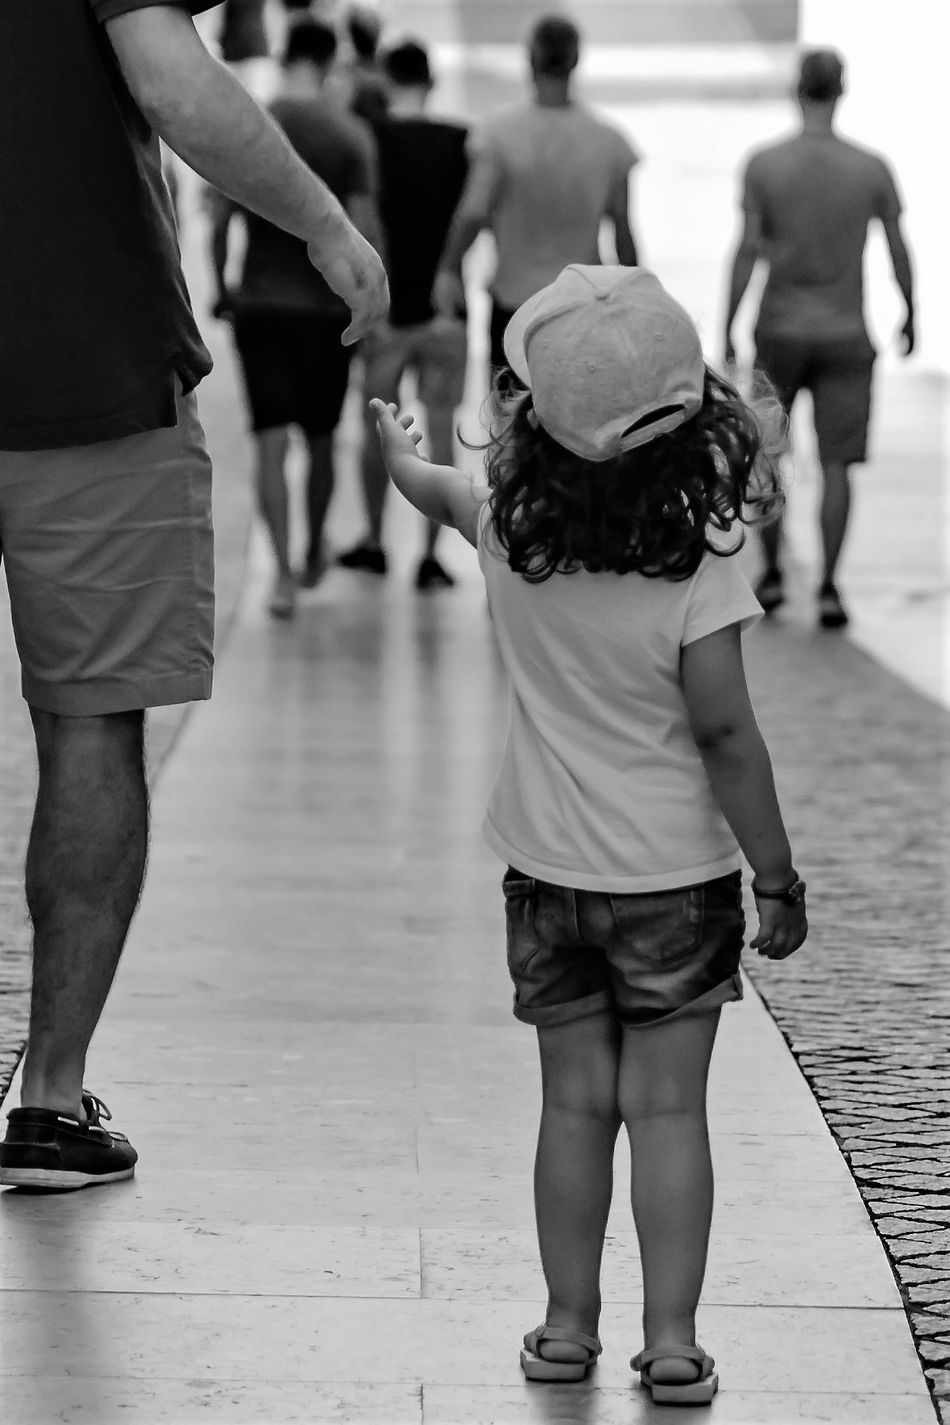 Daughter Little Safe Safety Adult Child Father Filha  Gesto Hand Human Body Part Mao Men Pai Pequena♥ Real People Seguranca Seguridad Seguro Walking